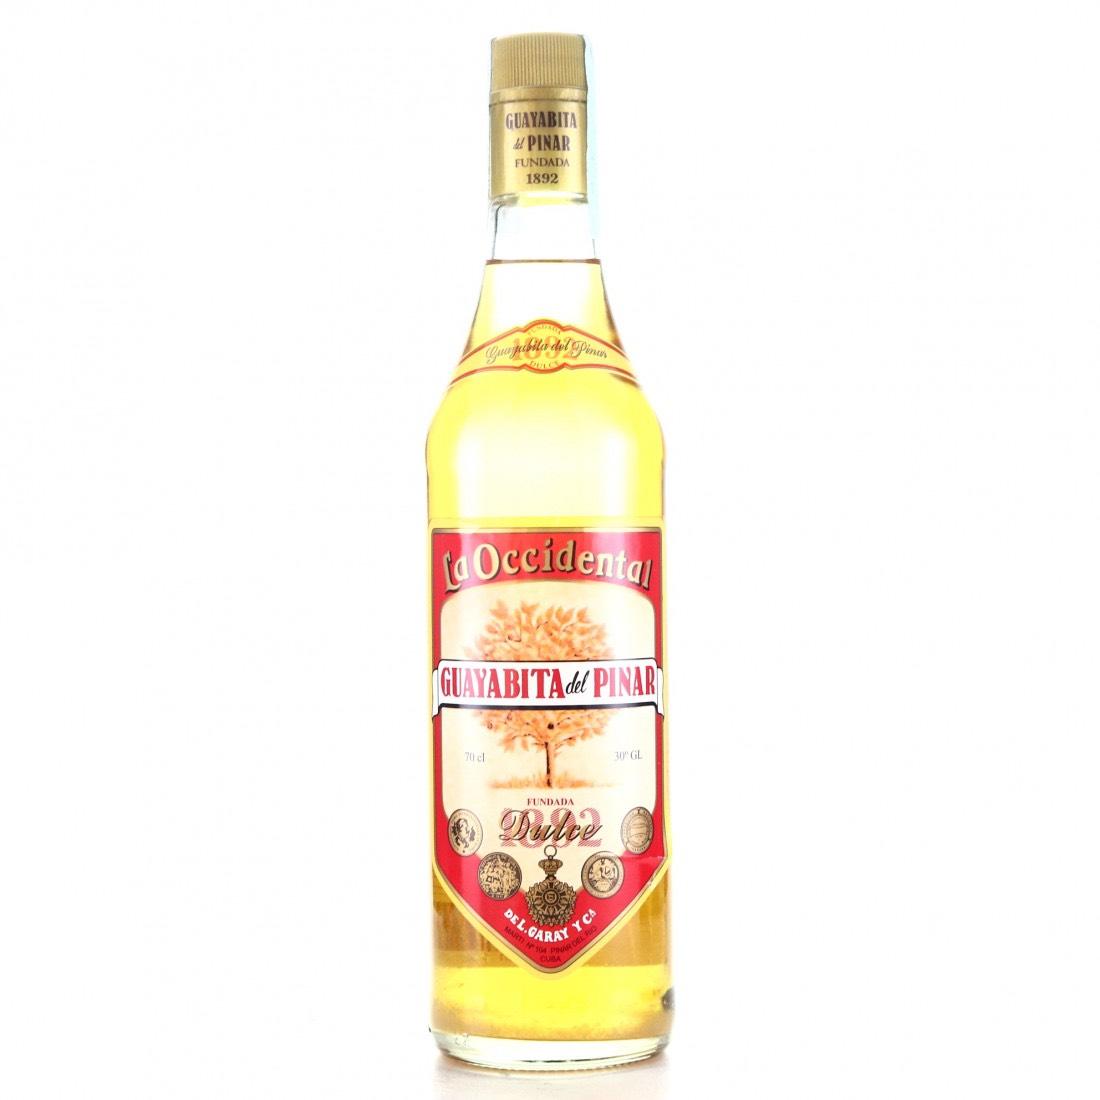 Bottle image of La Occidental Guayabita del Pinar